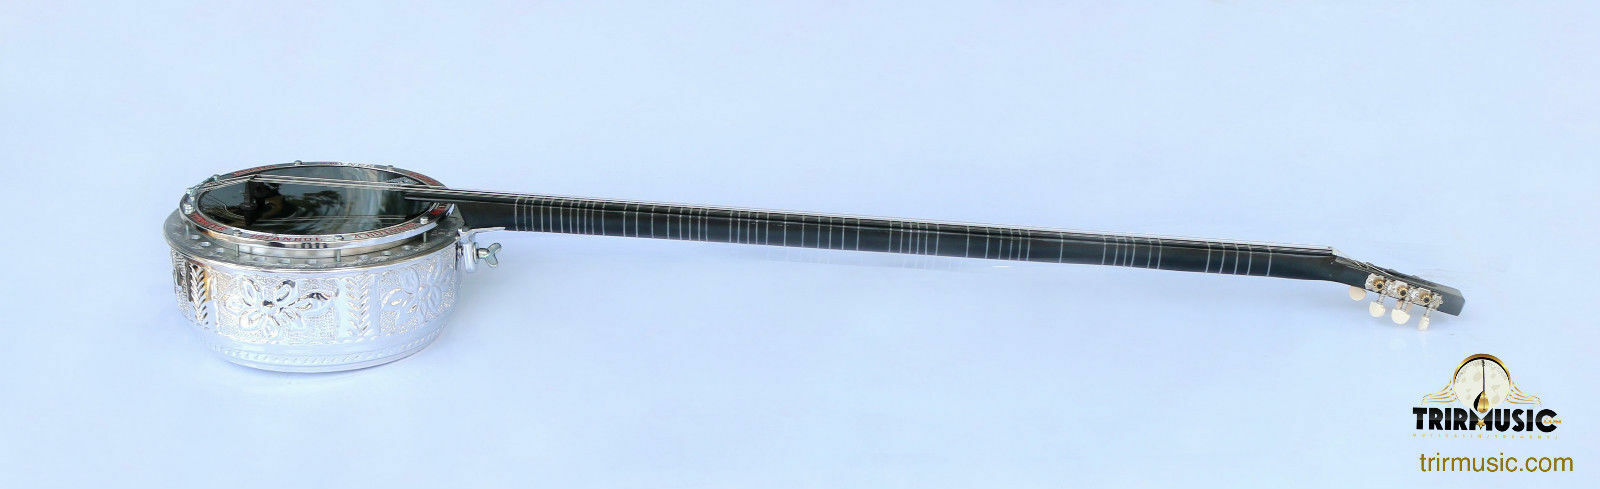 Turkish String Instrument Cumbus Cumbush Yaylı Tanbur Tanbur Tanbur Saz By Zeynel Abidin cc21e4